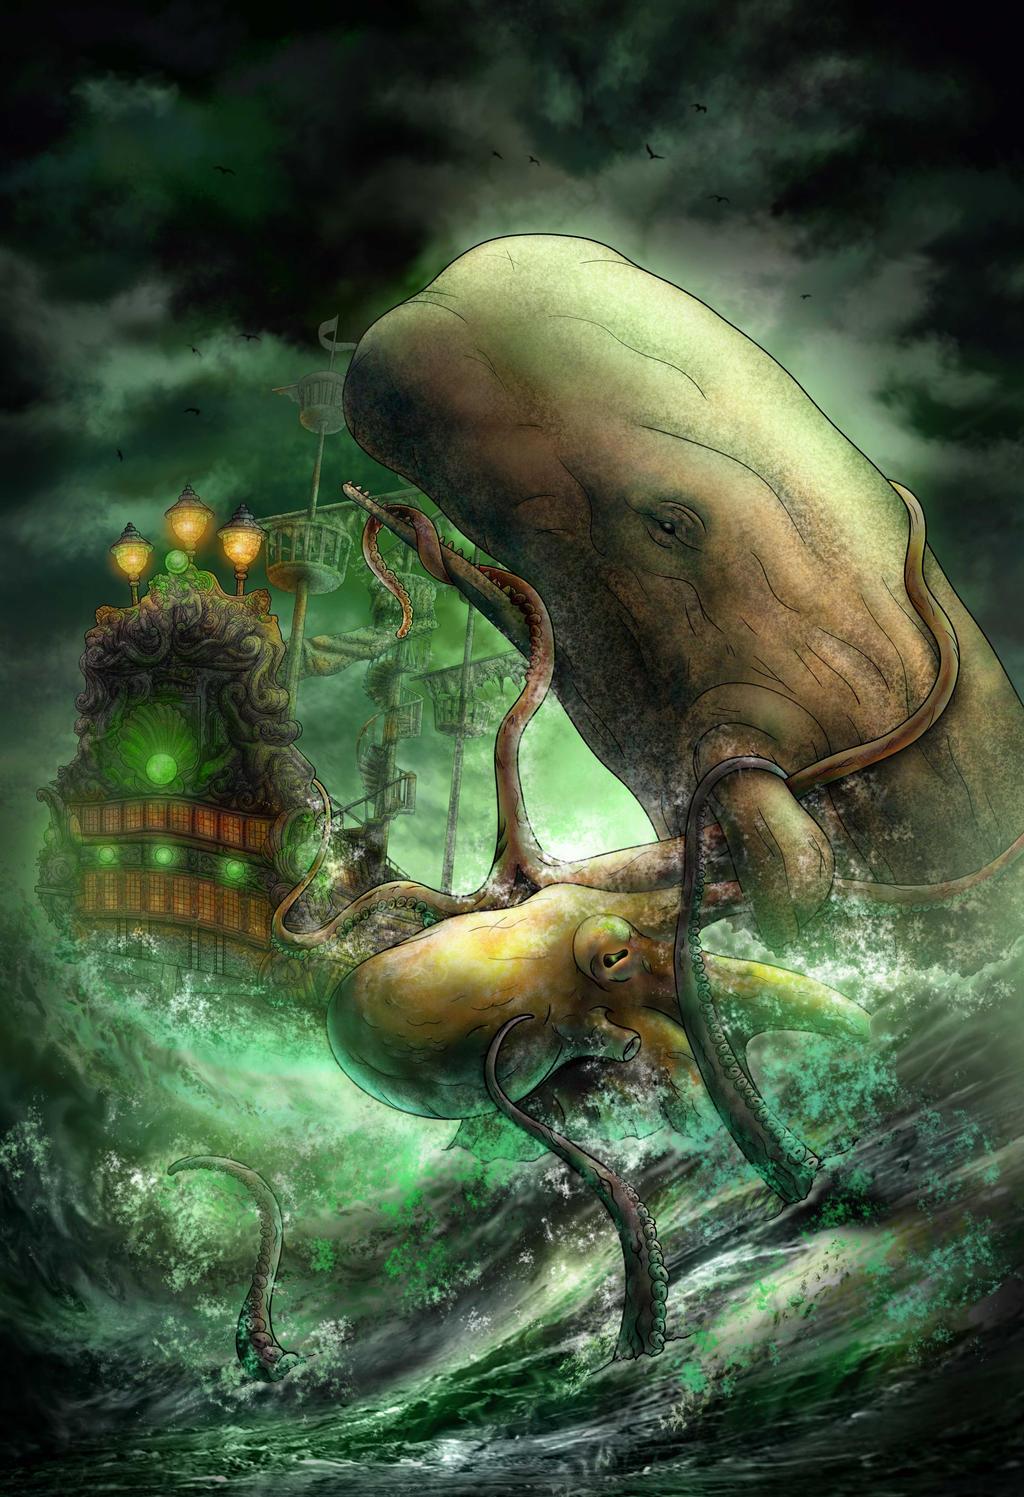 Moby Dick vs. The Kraken by poleson on DeviantArt